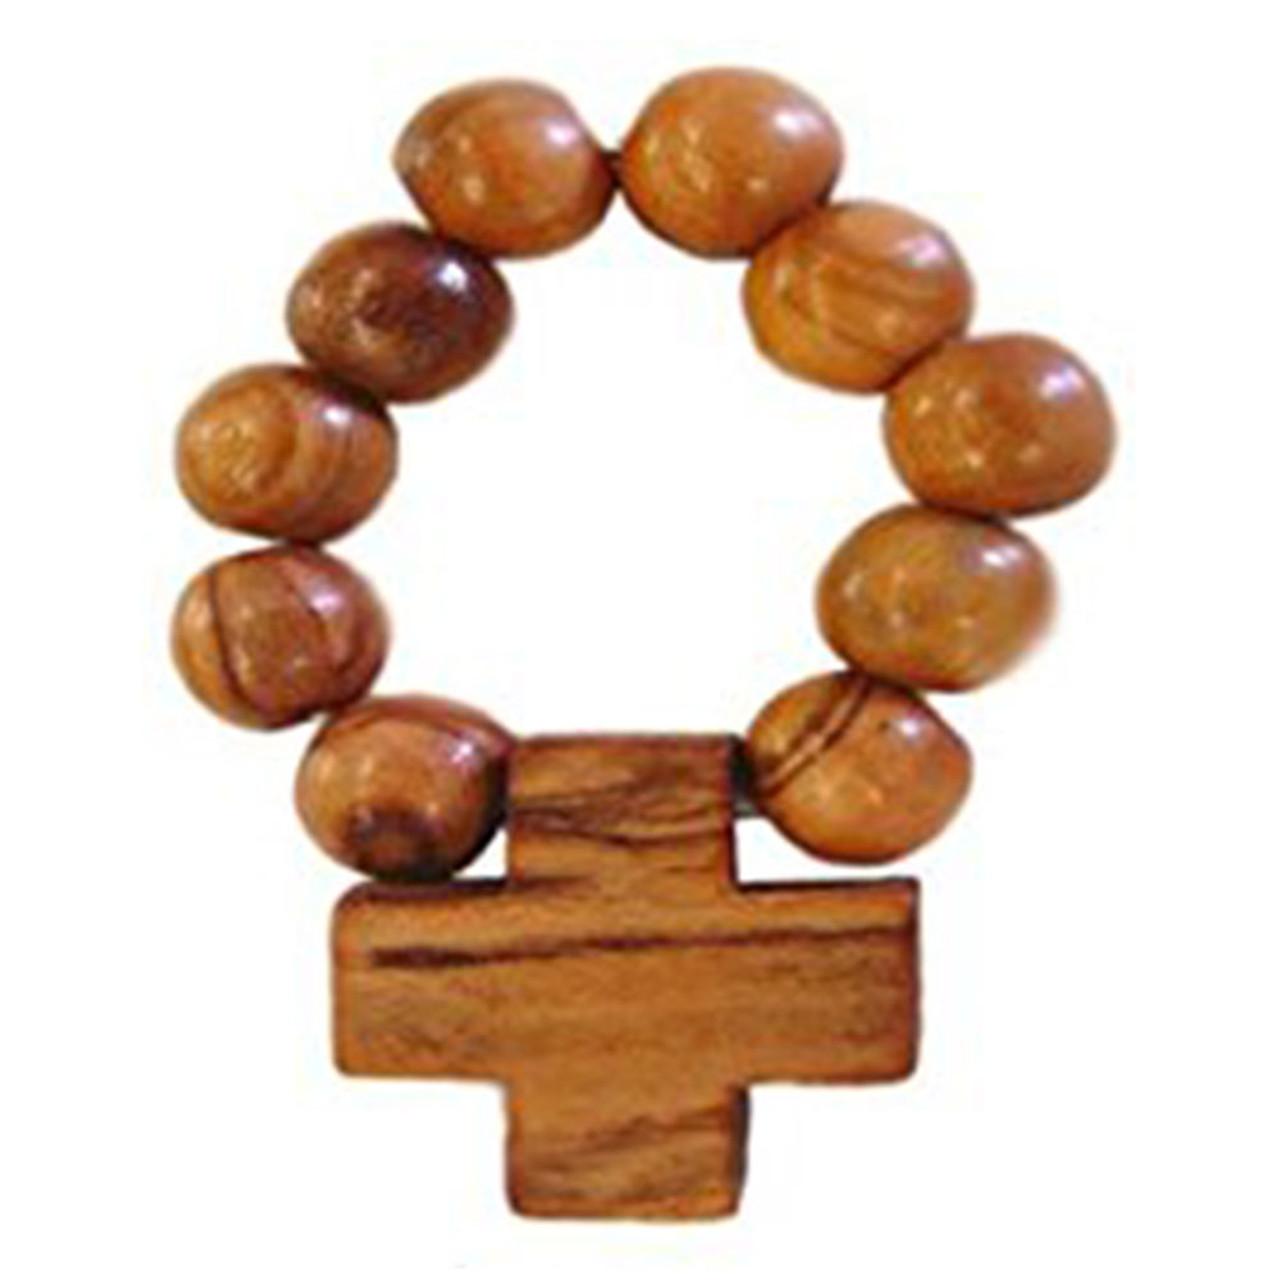 Olive Wood Finger Rosary made in Bethlehem